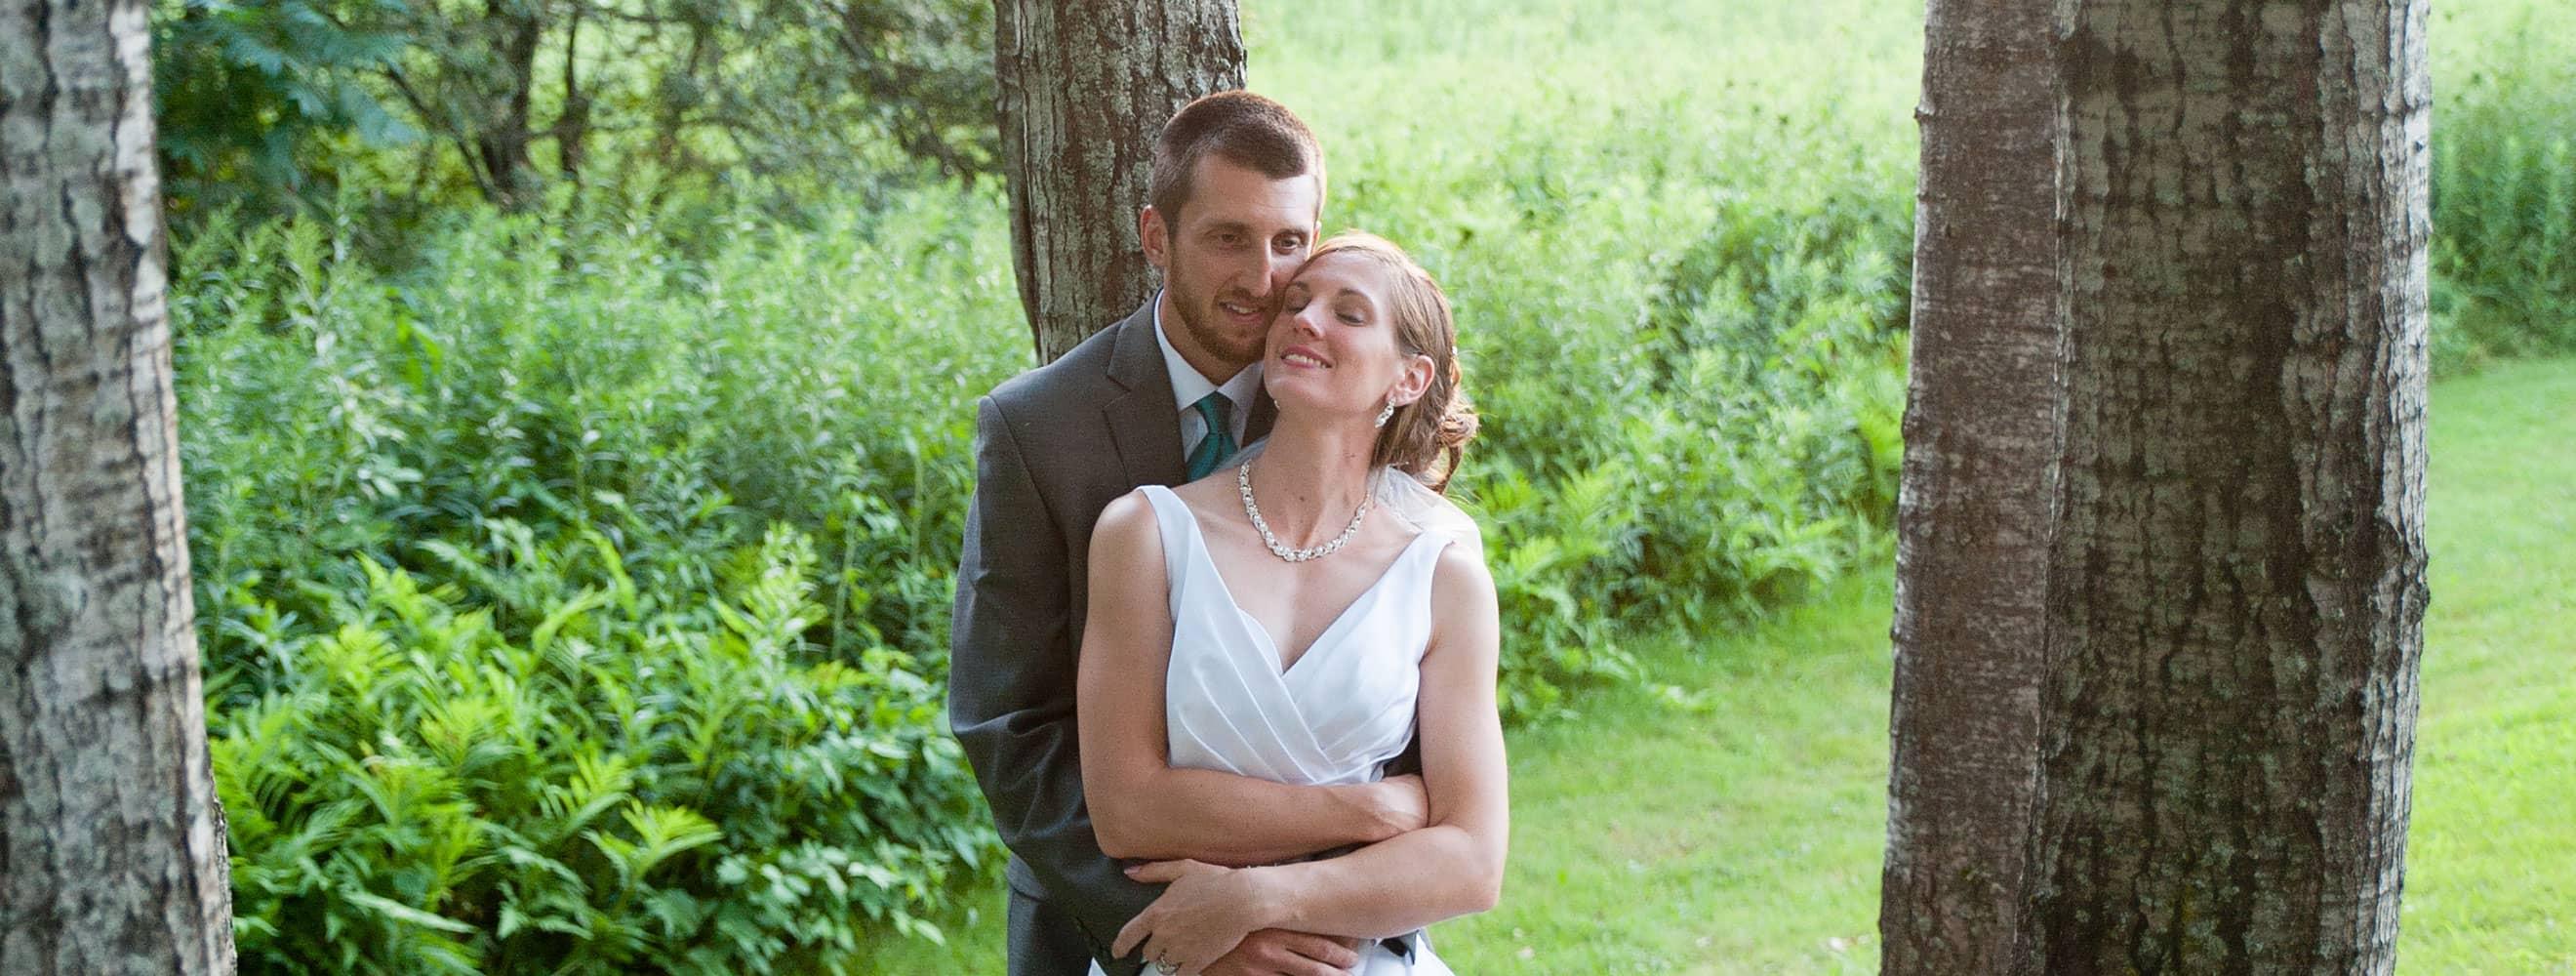 Newlyweds embrace among the trees